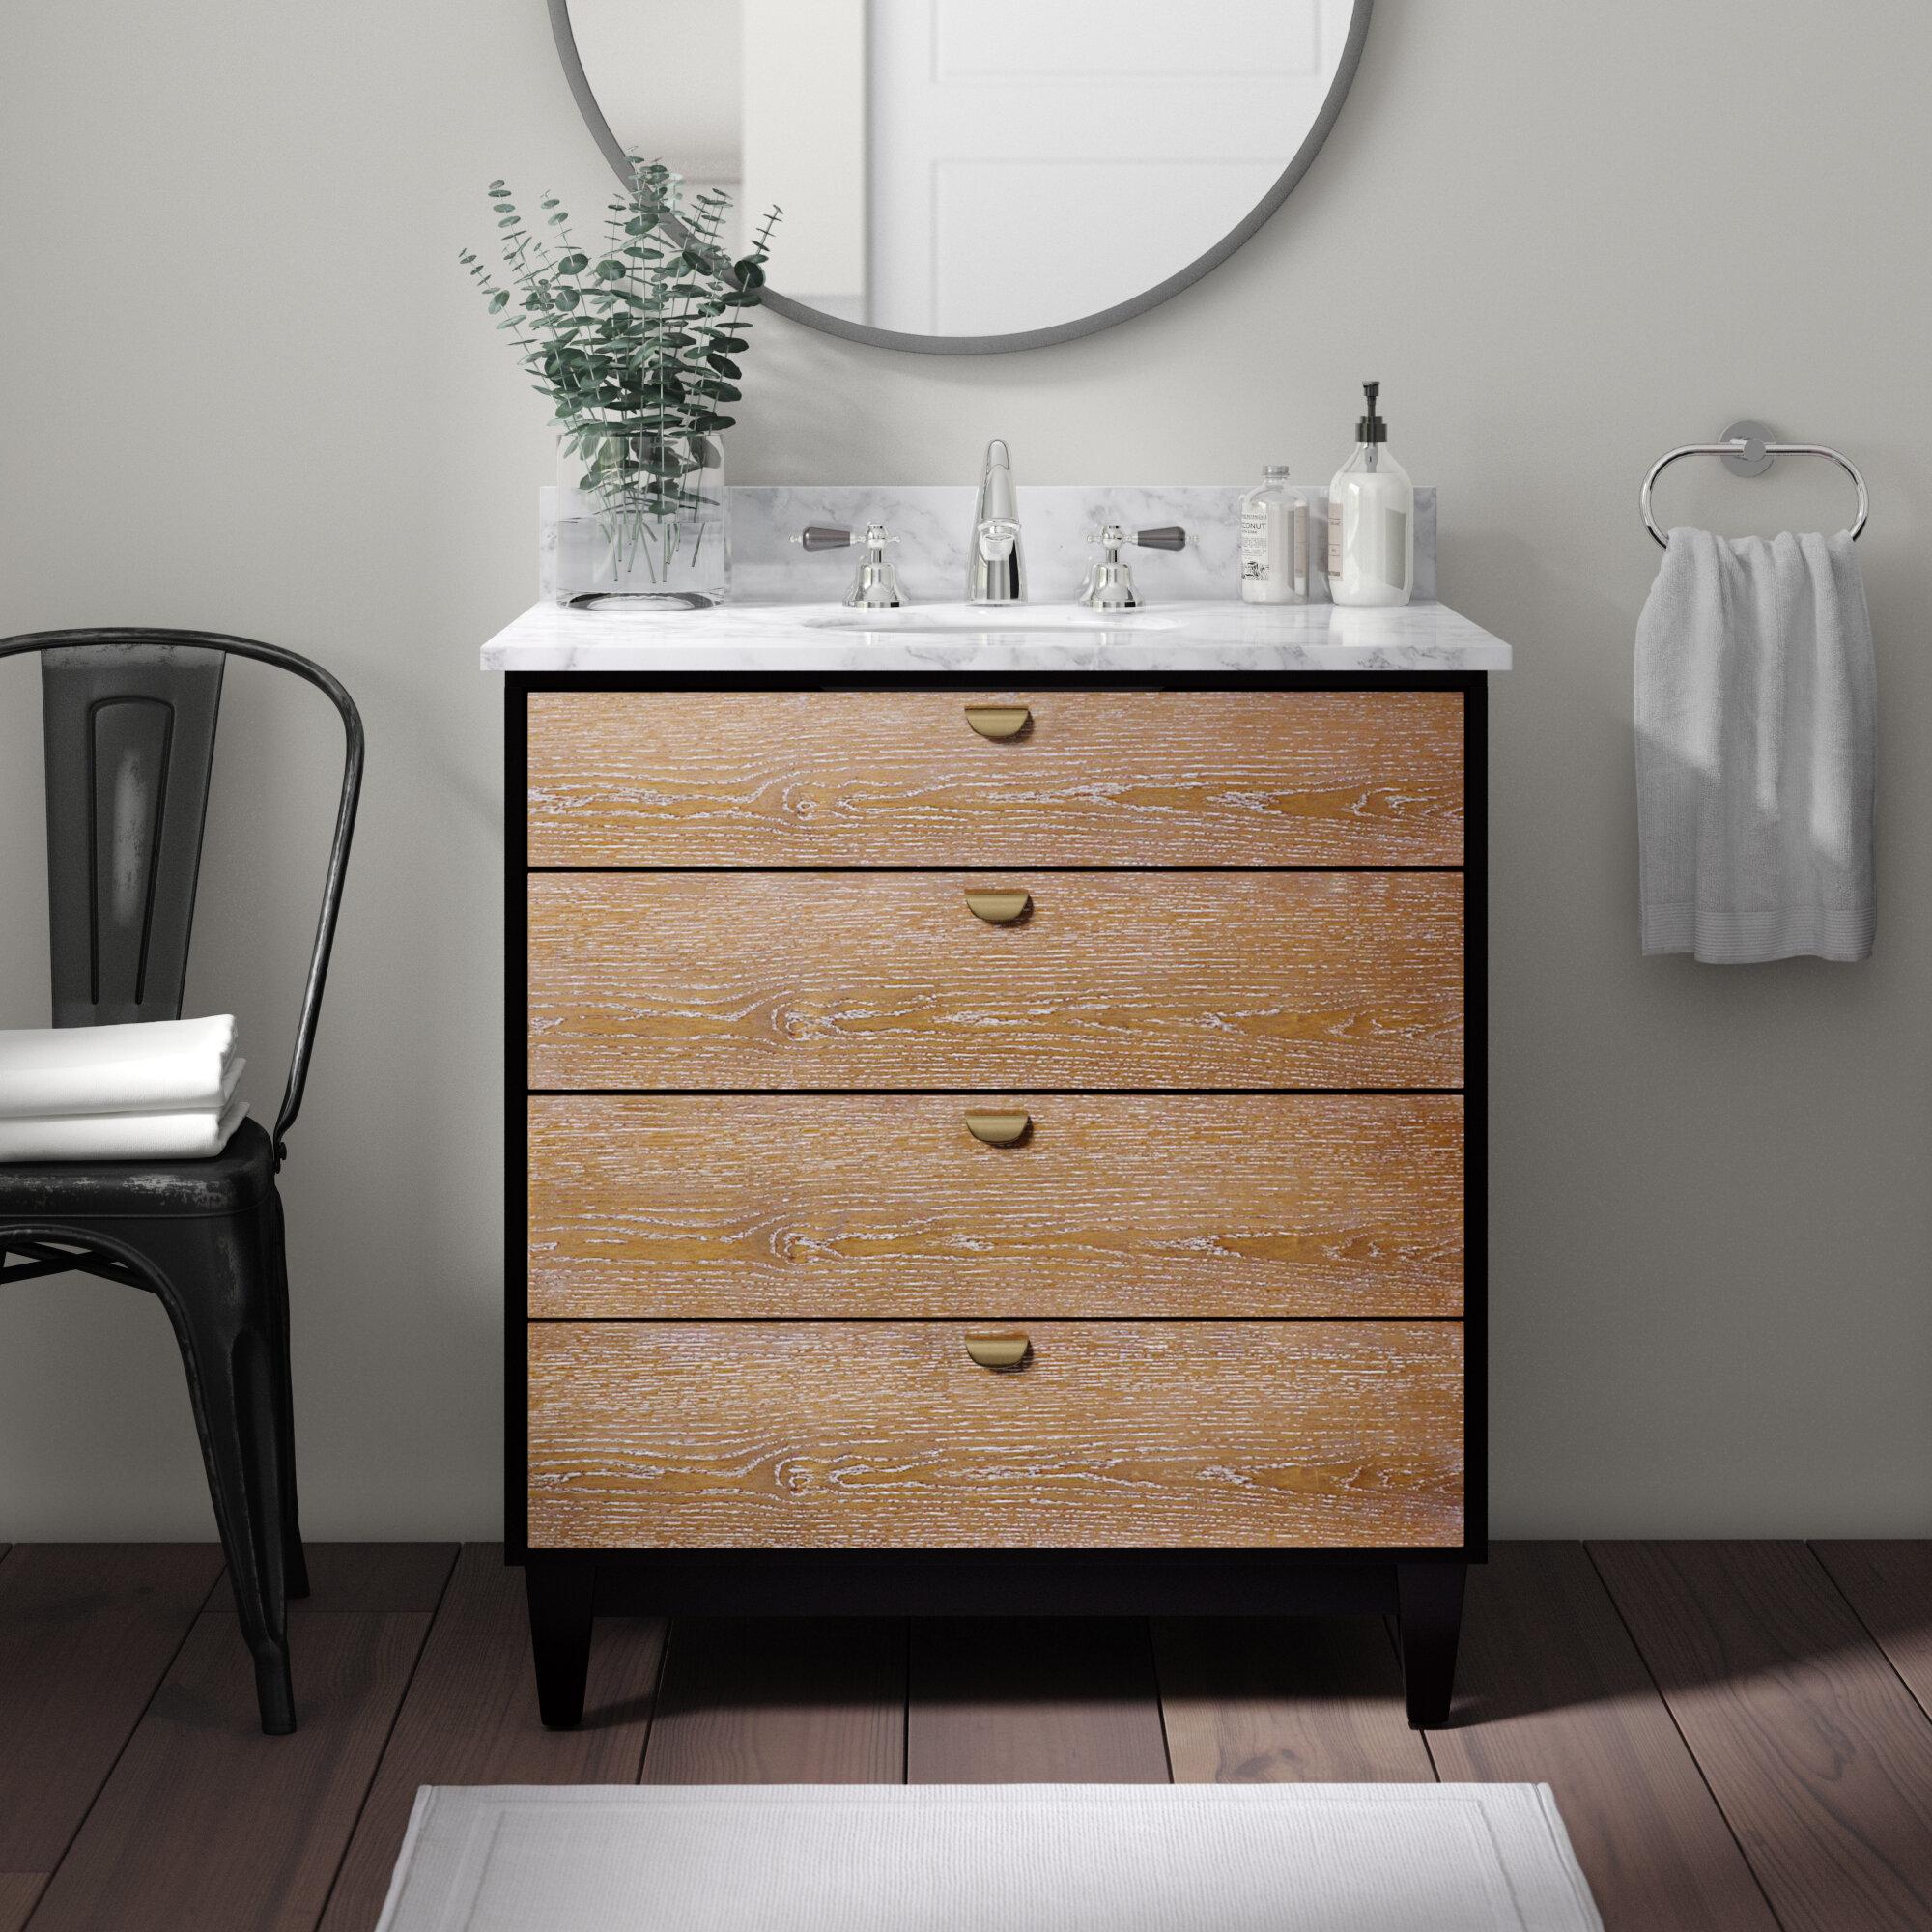 Union Rustic Holly Martin Tobin Bath Vanity Sink W Marble Top Industrial Style Limed Burnt Oak W Black And Grey Marble Reviews Wayfair Ca